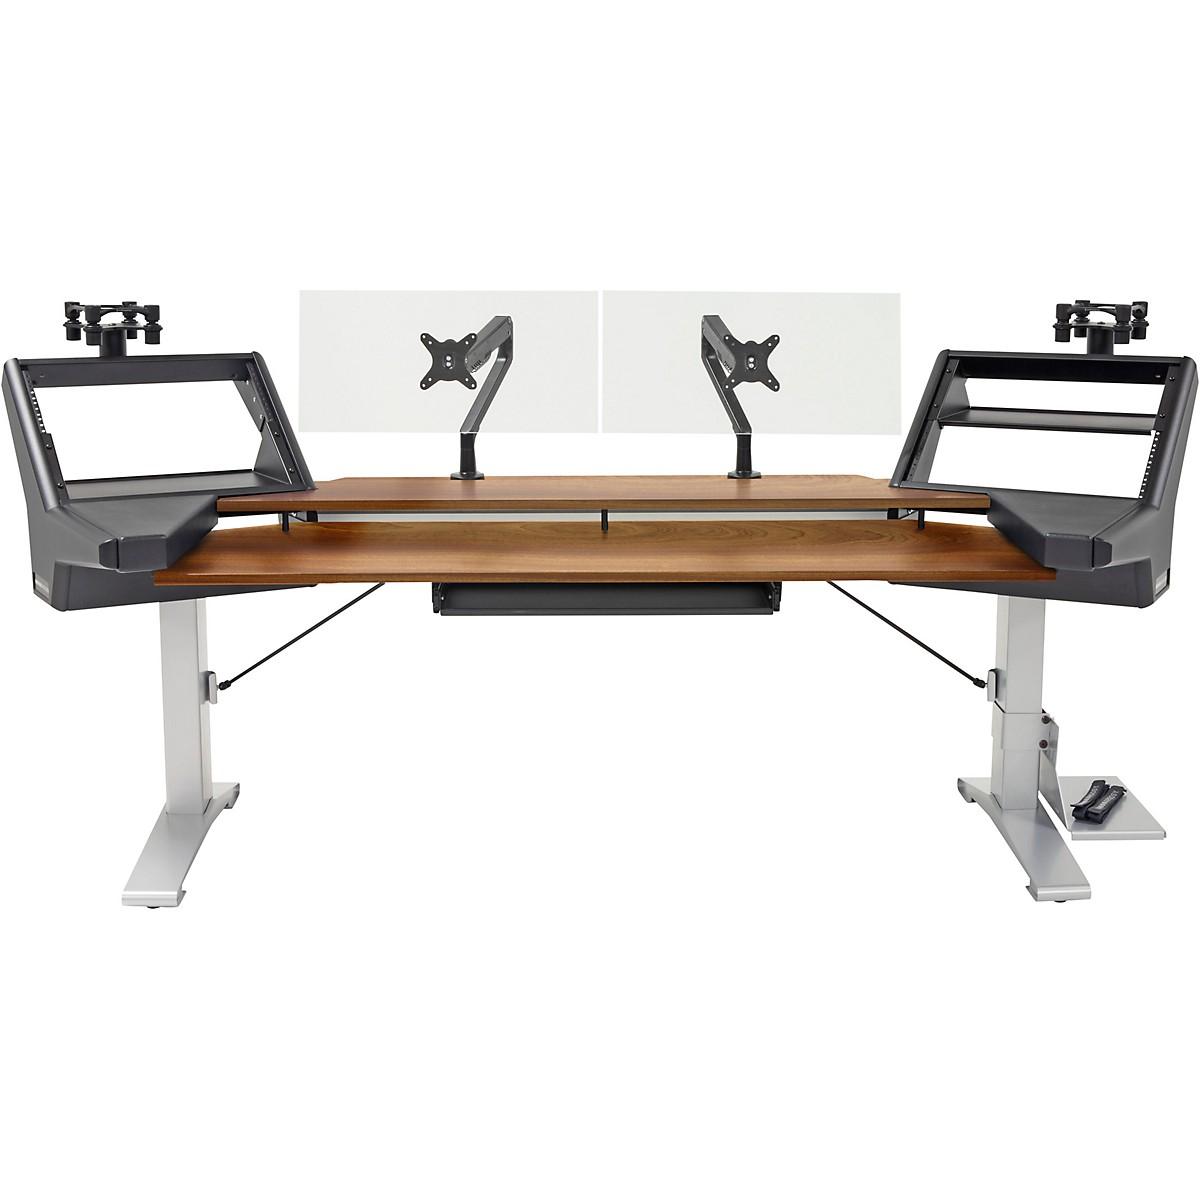 Argosy Halo K88 XC Ultimate Desk with Mahogany Surface